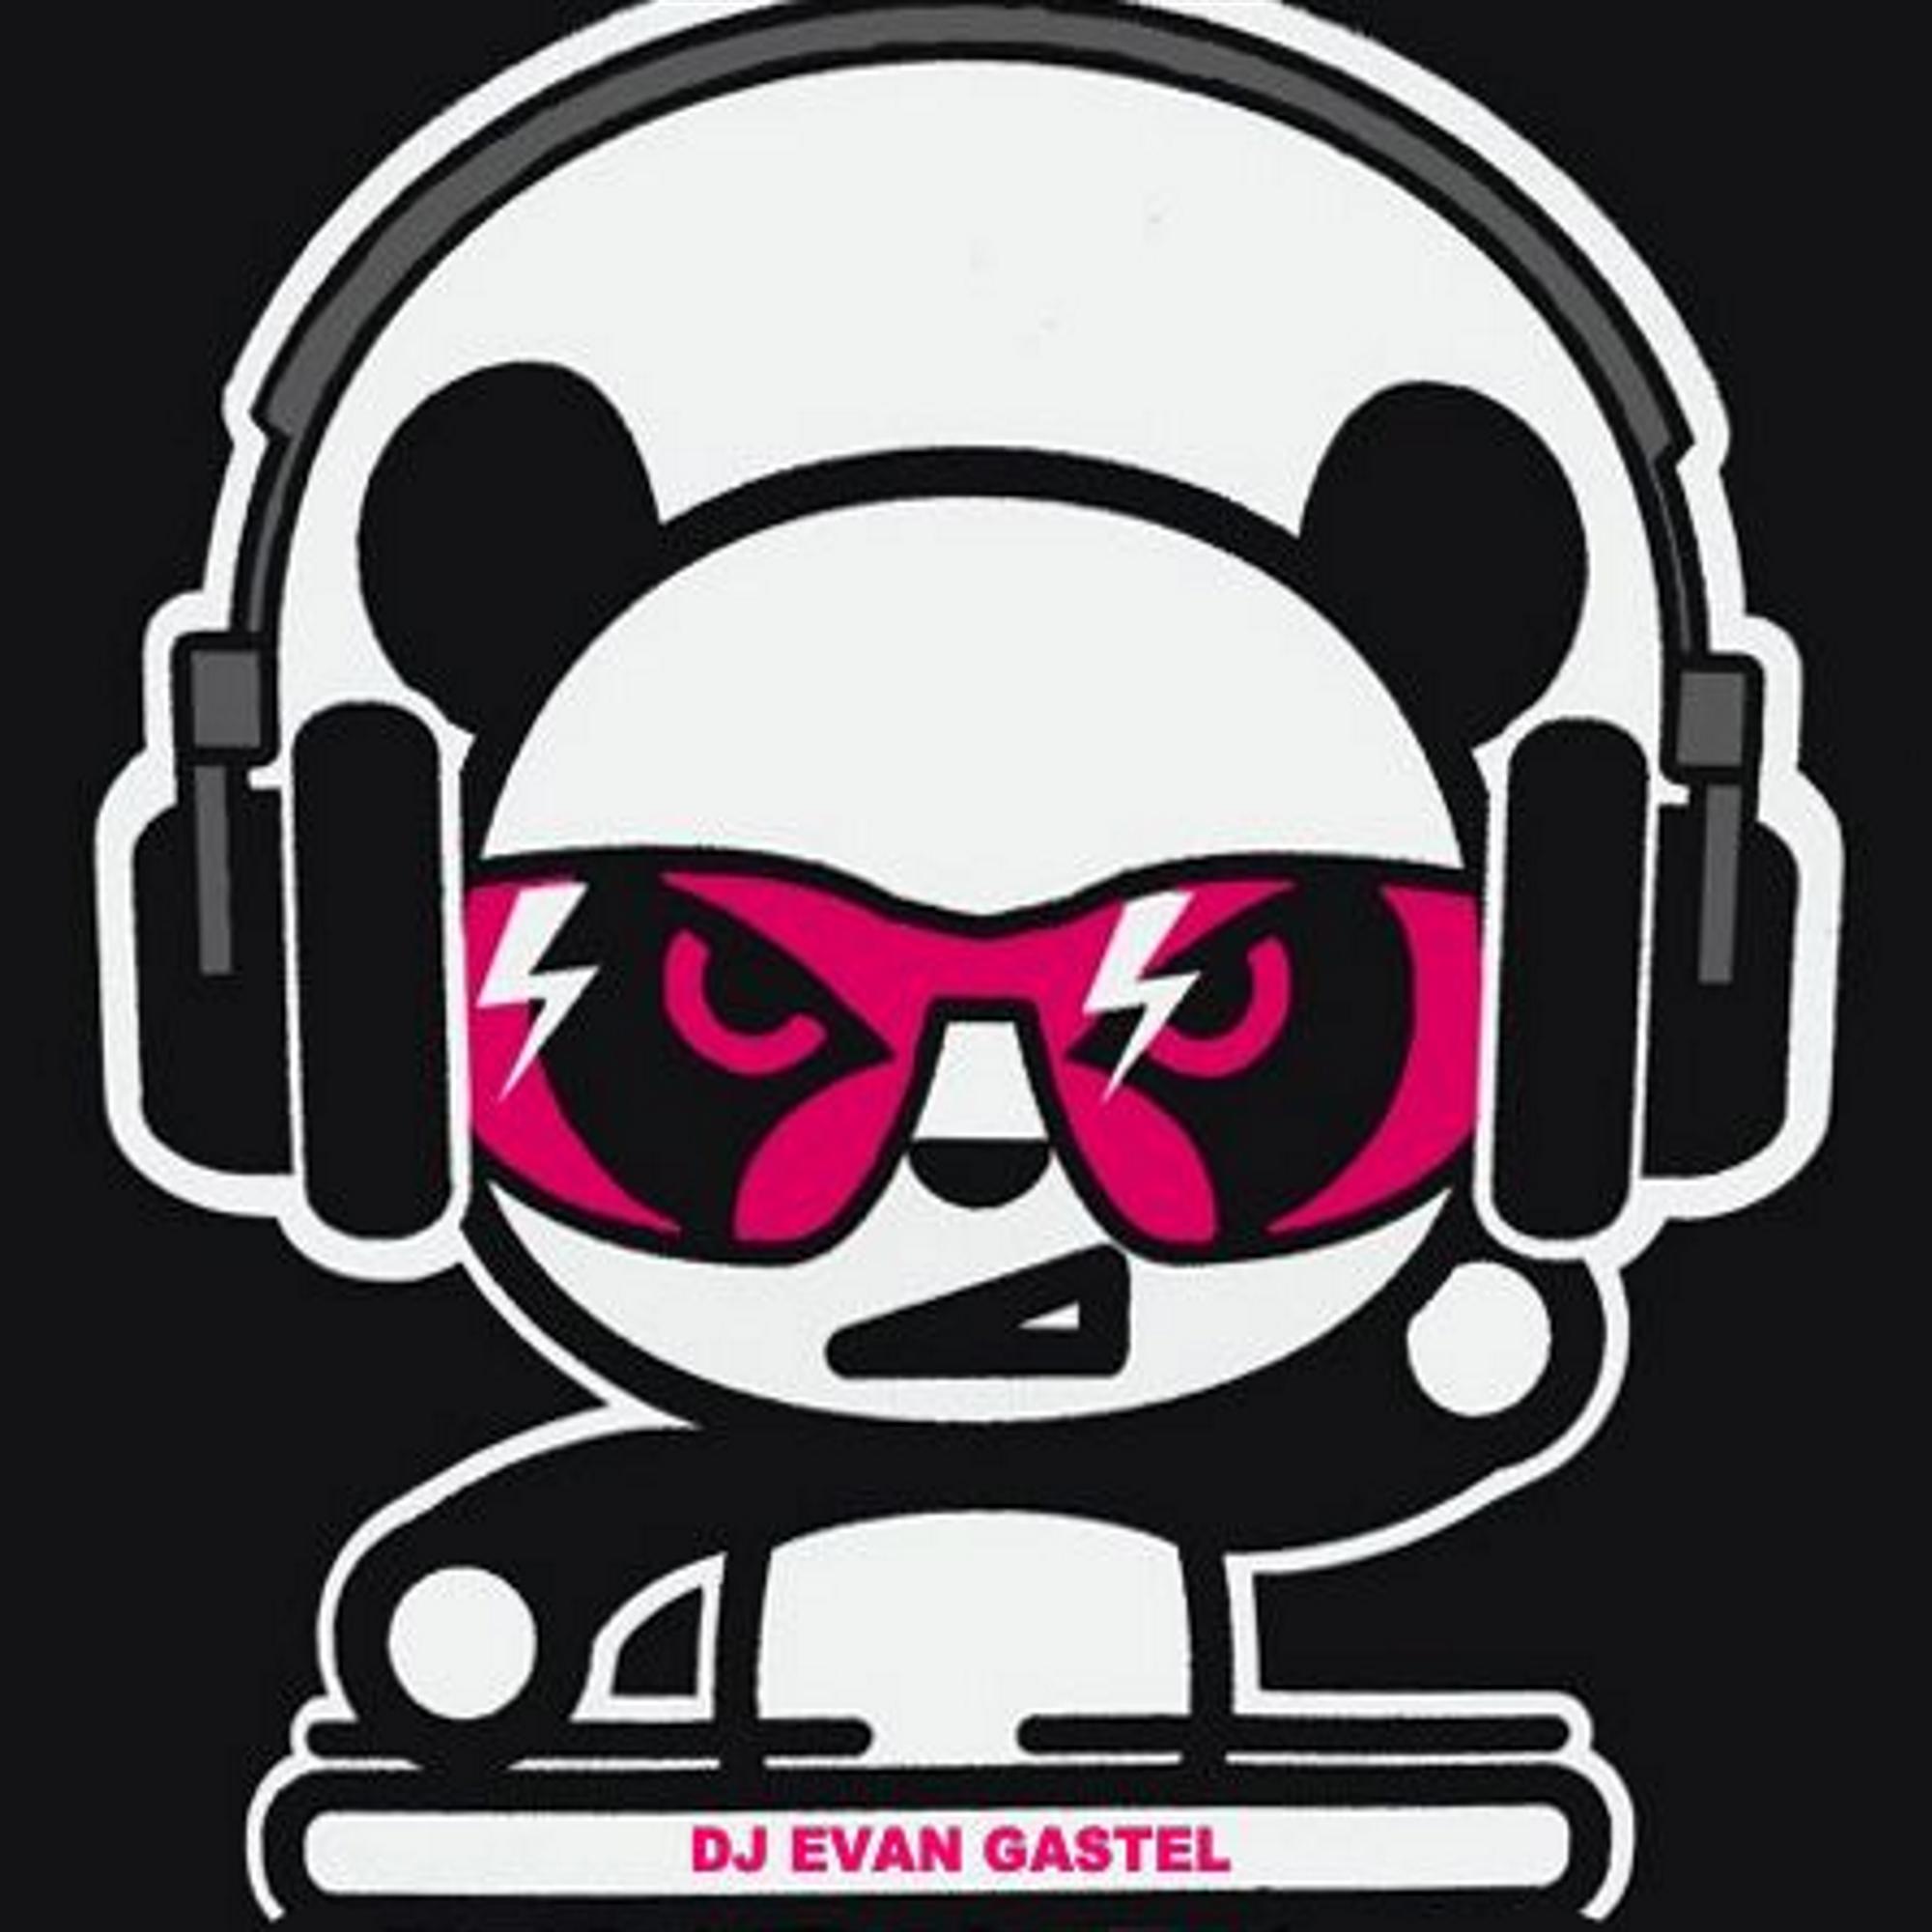 DJ EVAN GASTEL